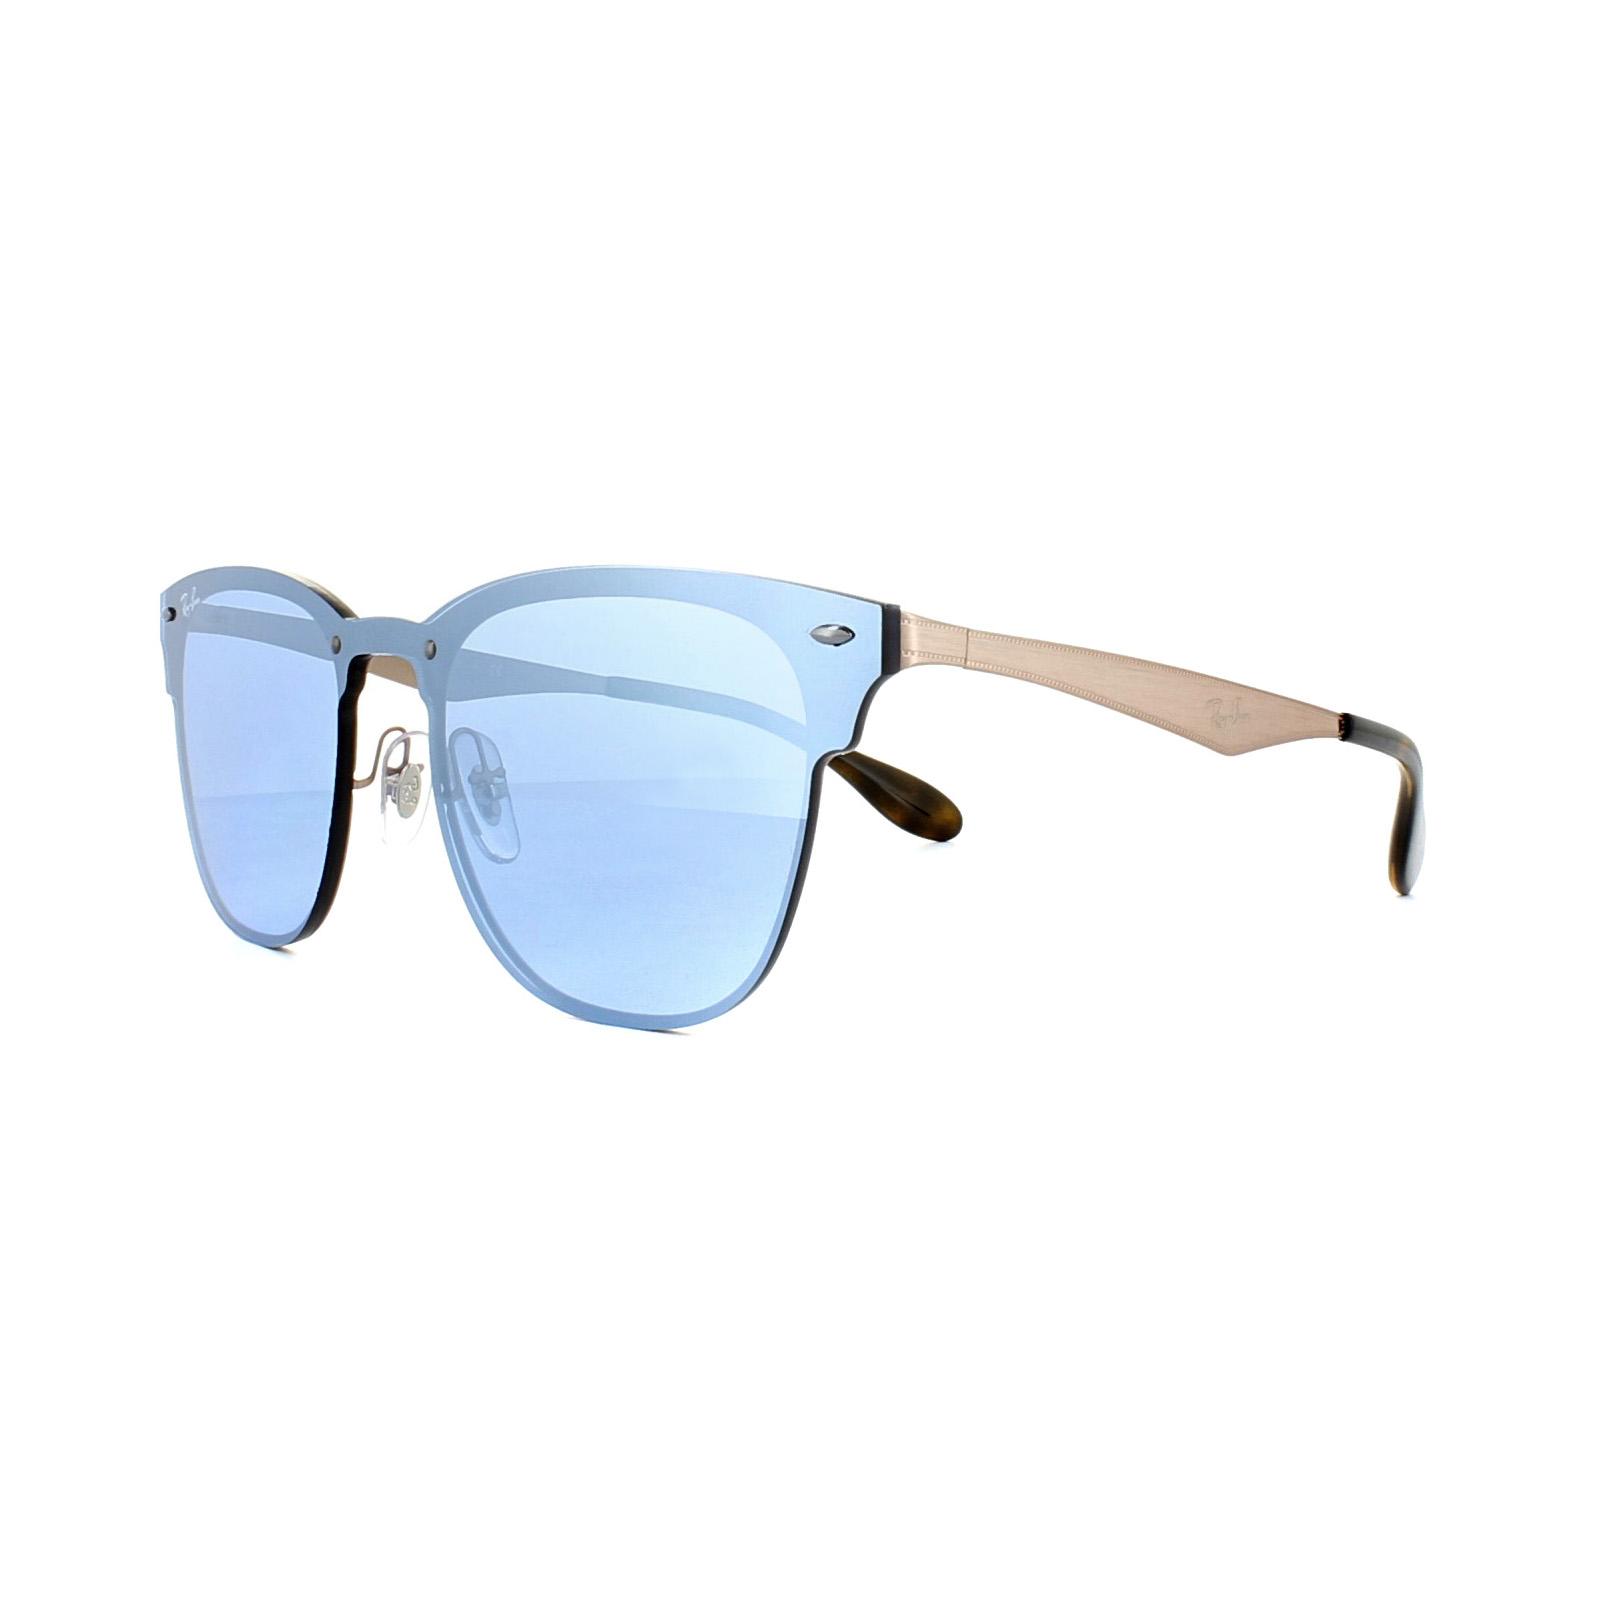 4833bd9c71 Sentinel Ray-Ban Sunglasses Blaze Clubmaster 3576N 90391U Copper Violet  Silver Mirror